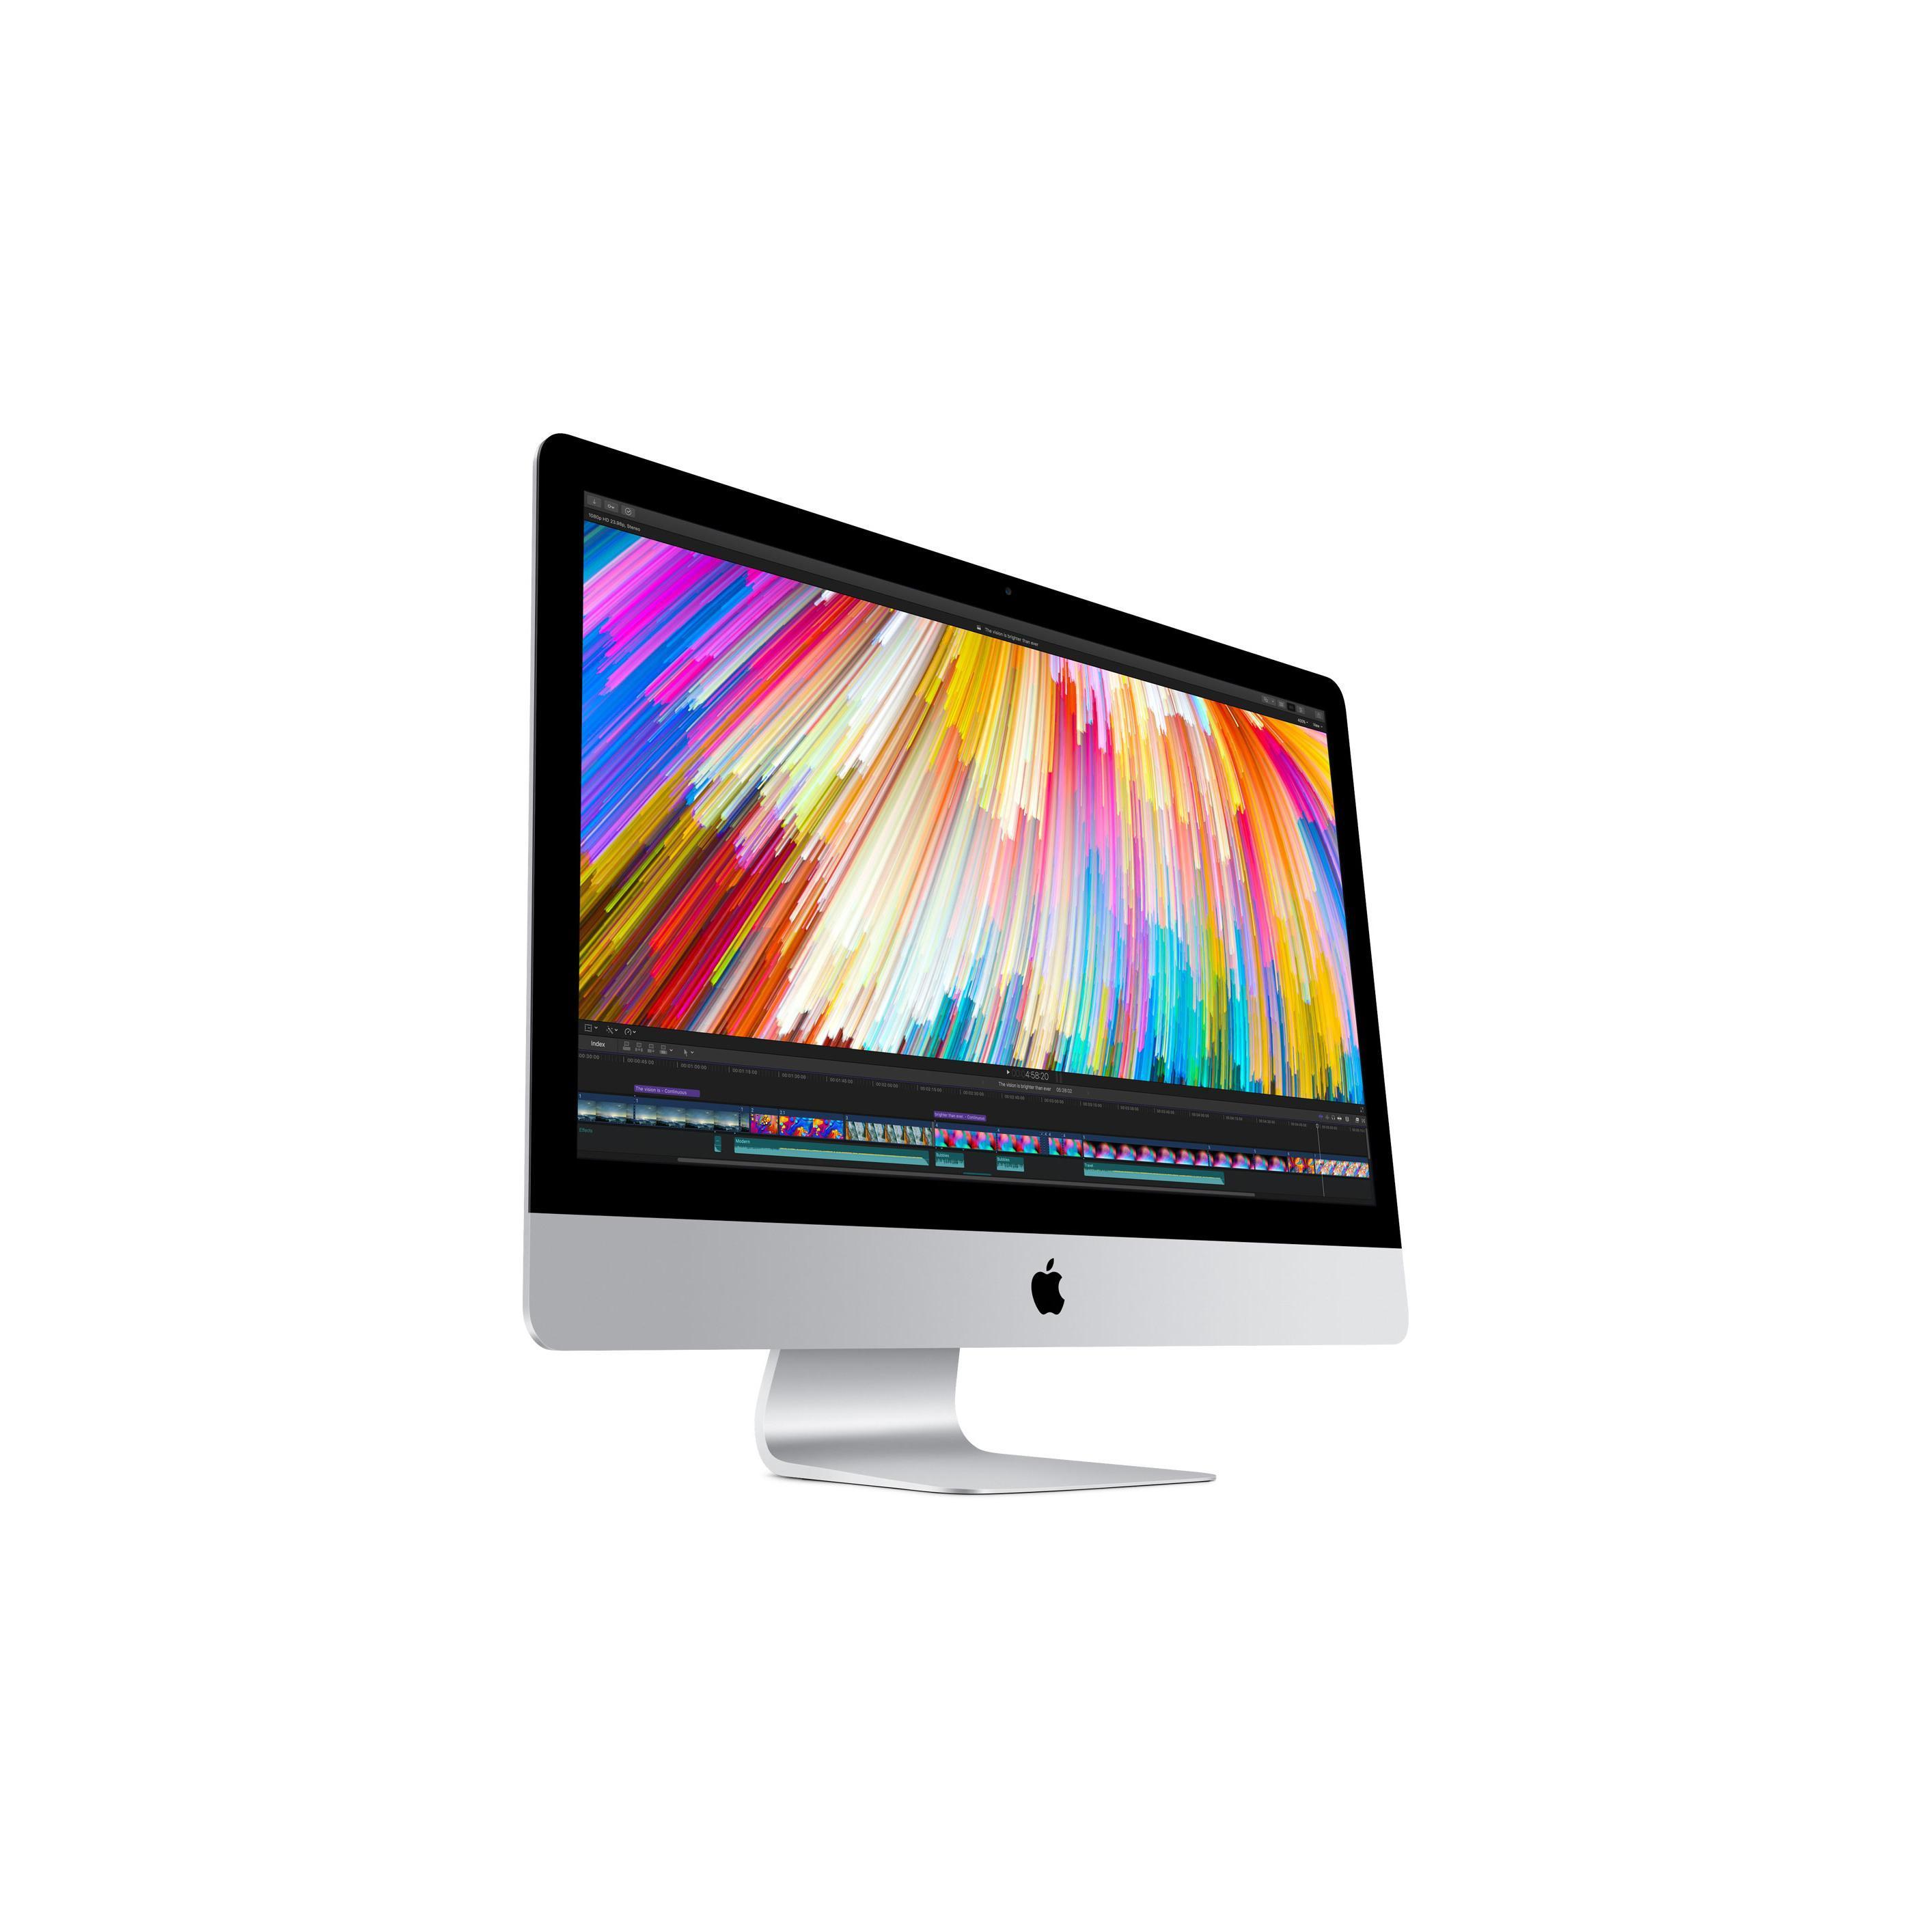 iMac 27-inch Retina (Late 2015) Core i5 3.2GHz - HDD 1 TB - 16GB QWERTY - English (US)